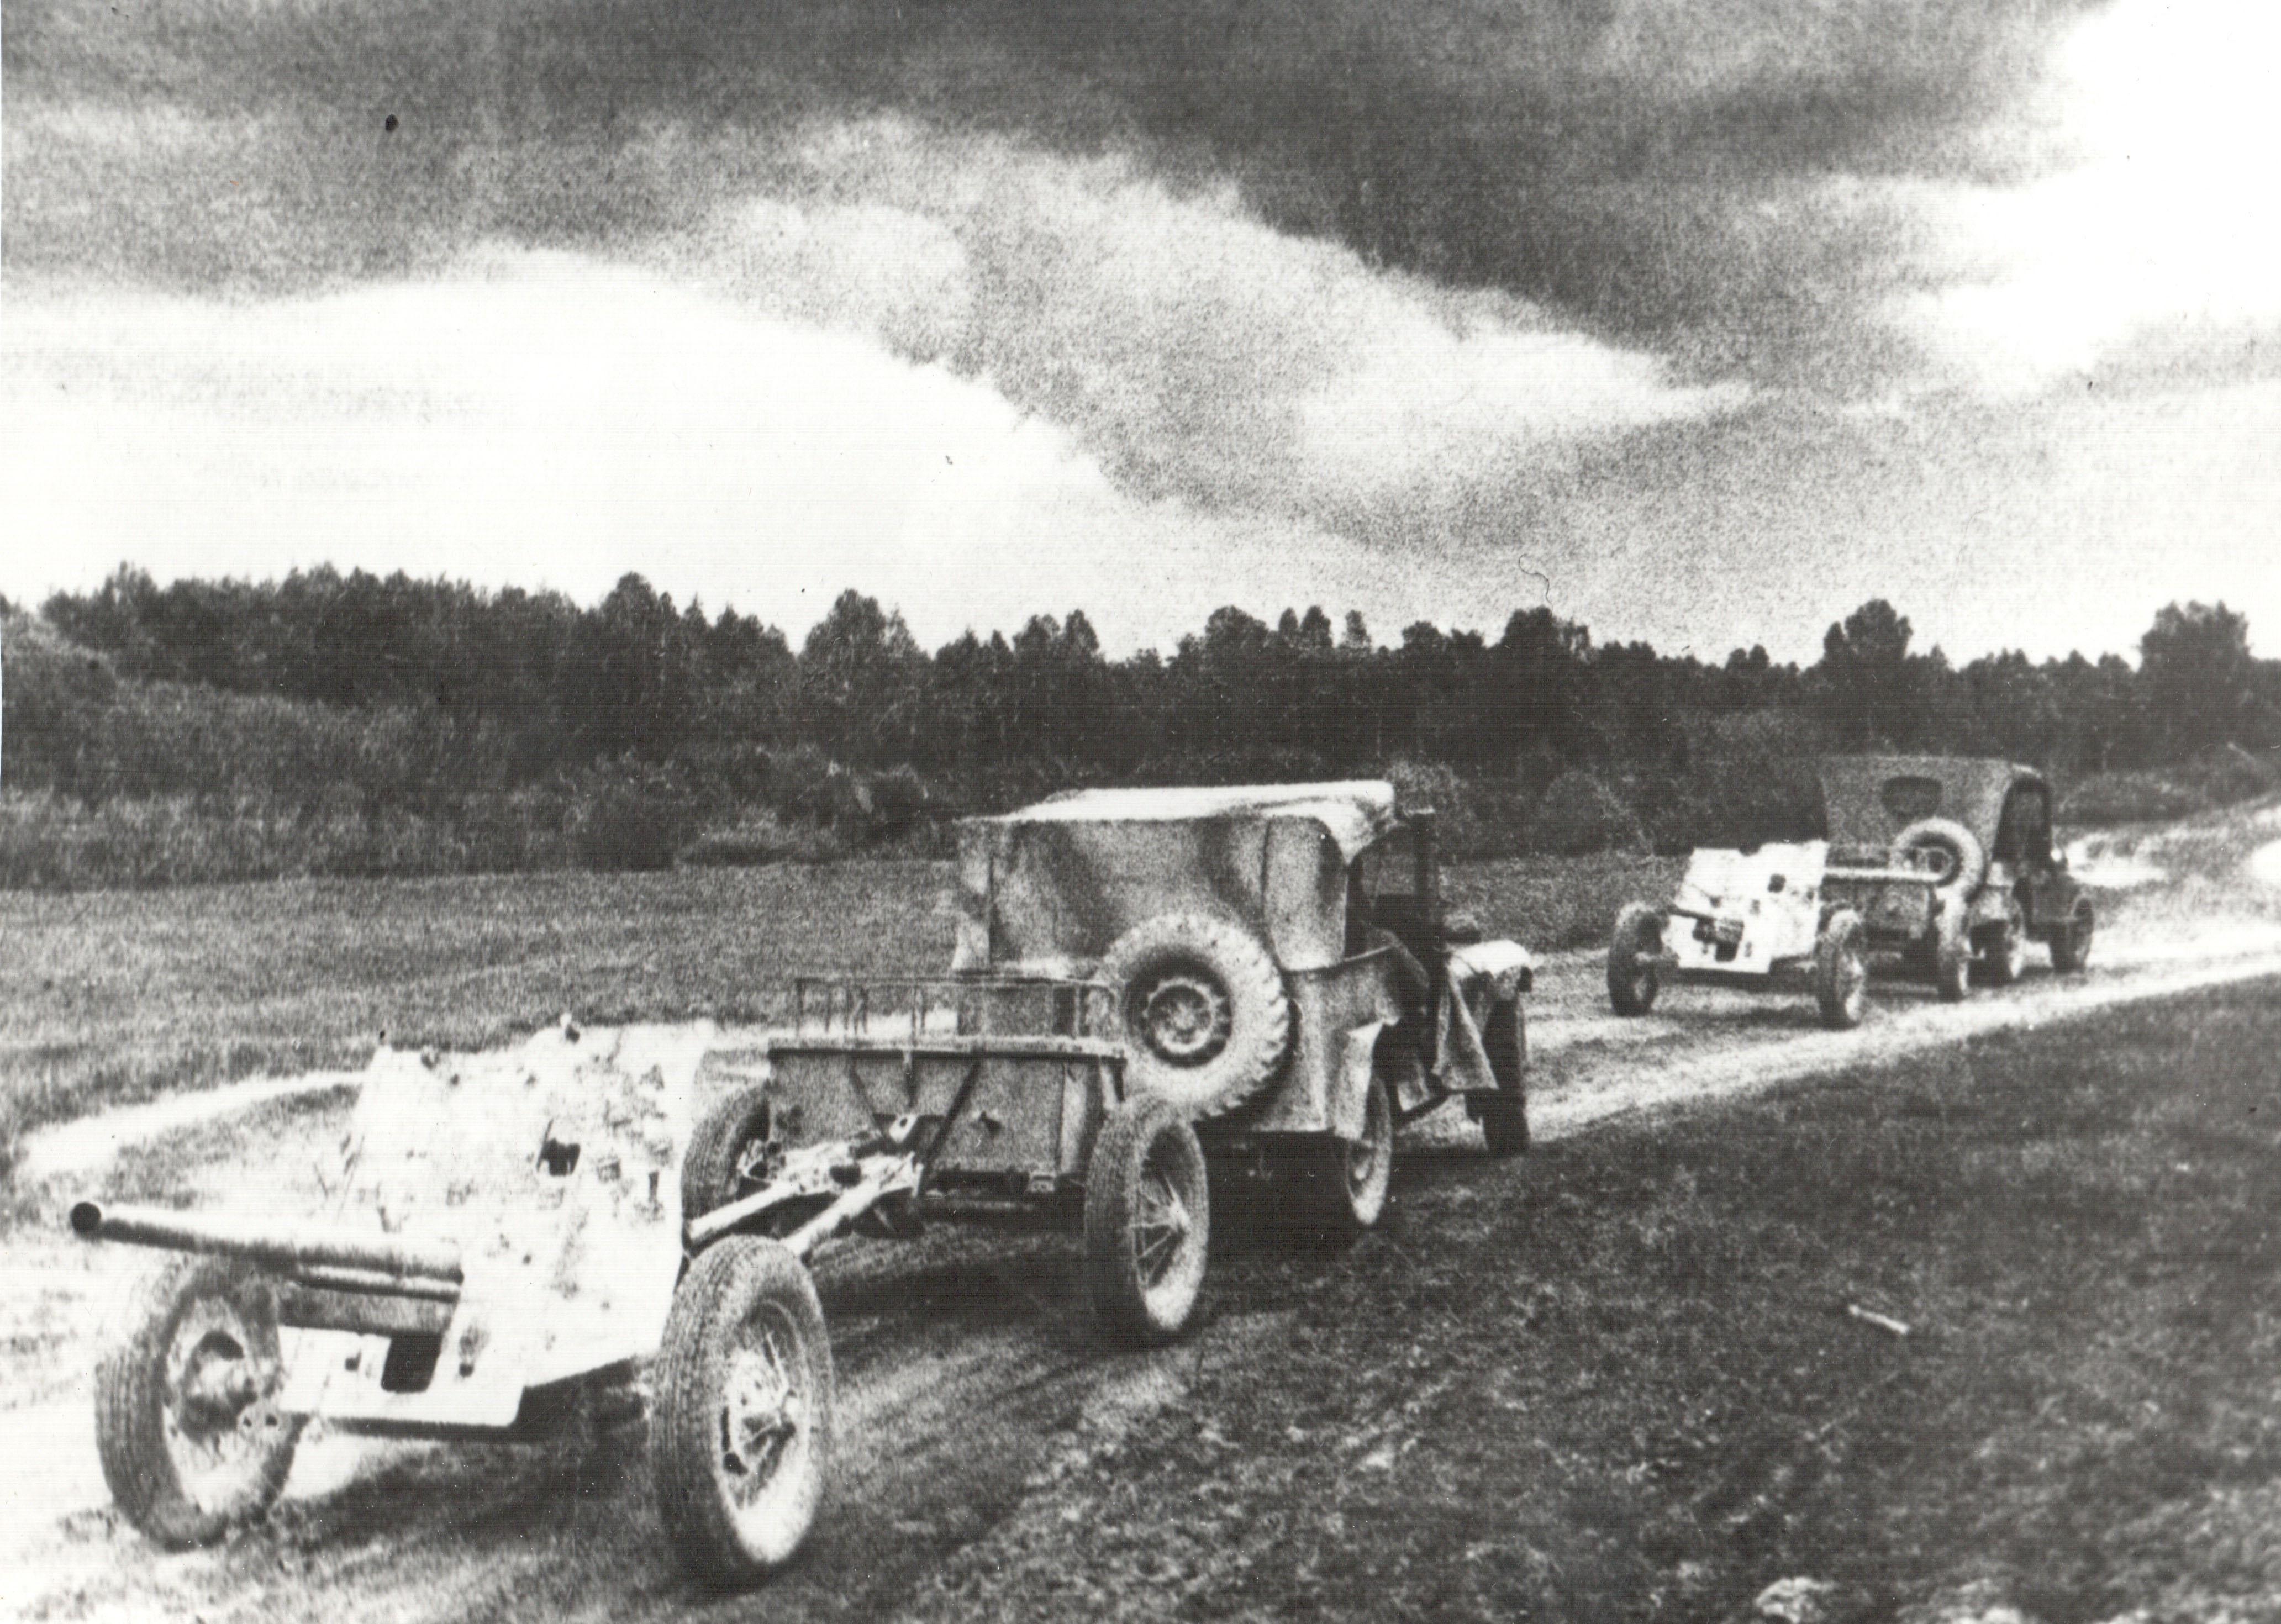 фото 45-мм противотанковой пушки